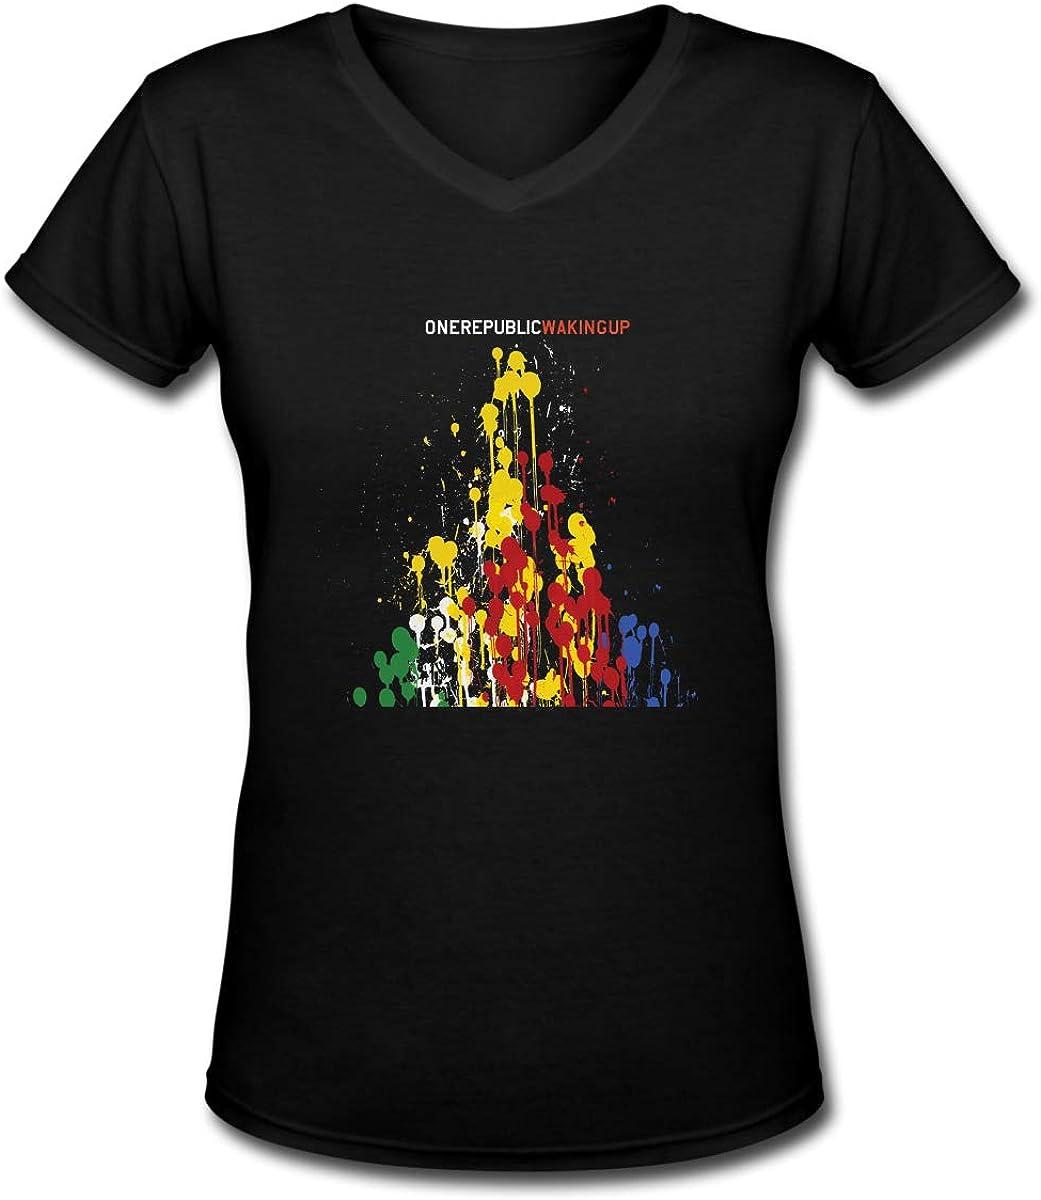 BuddhaGarment OneRepublic Women Pretty V-Neck Tee Shirt